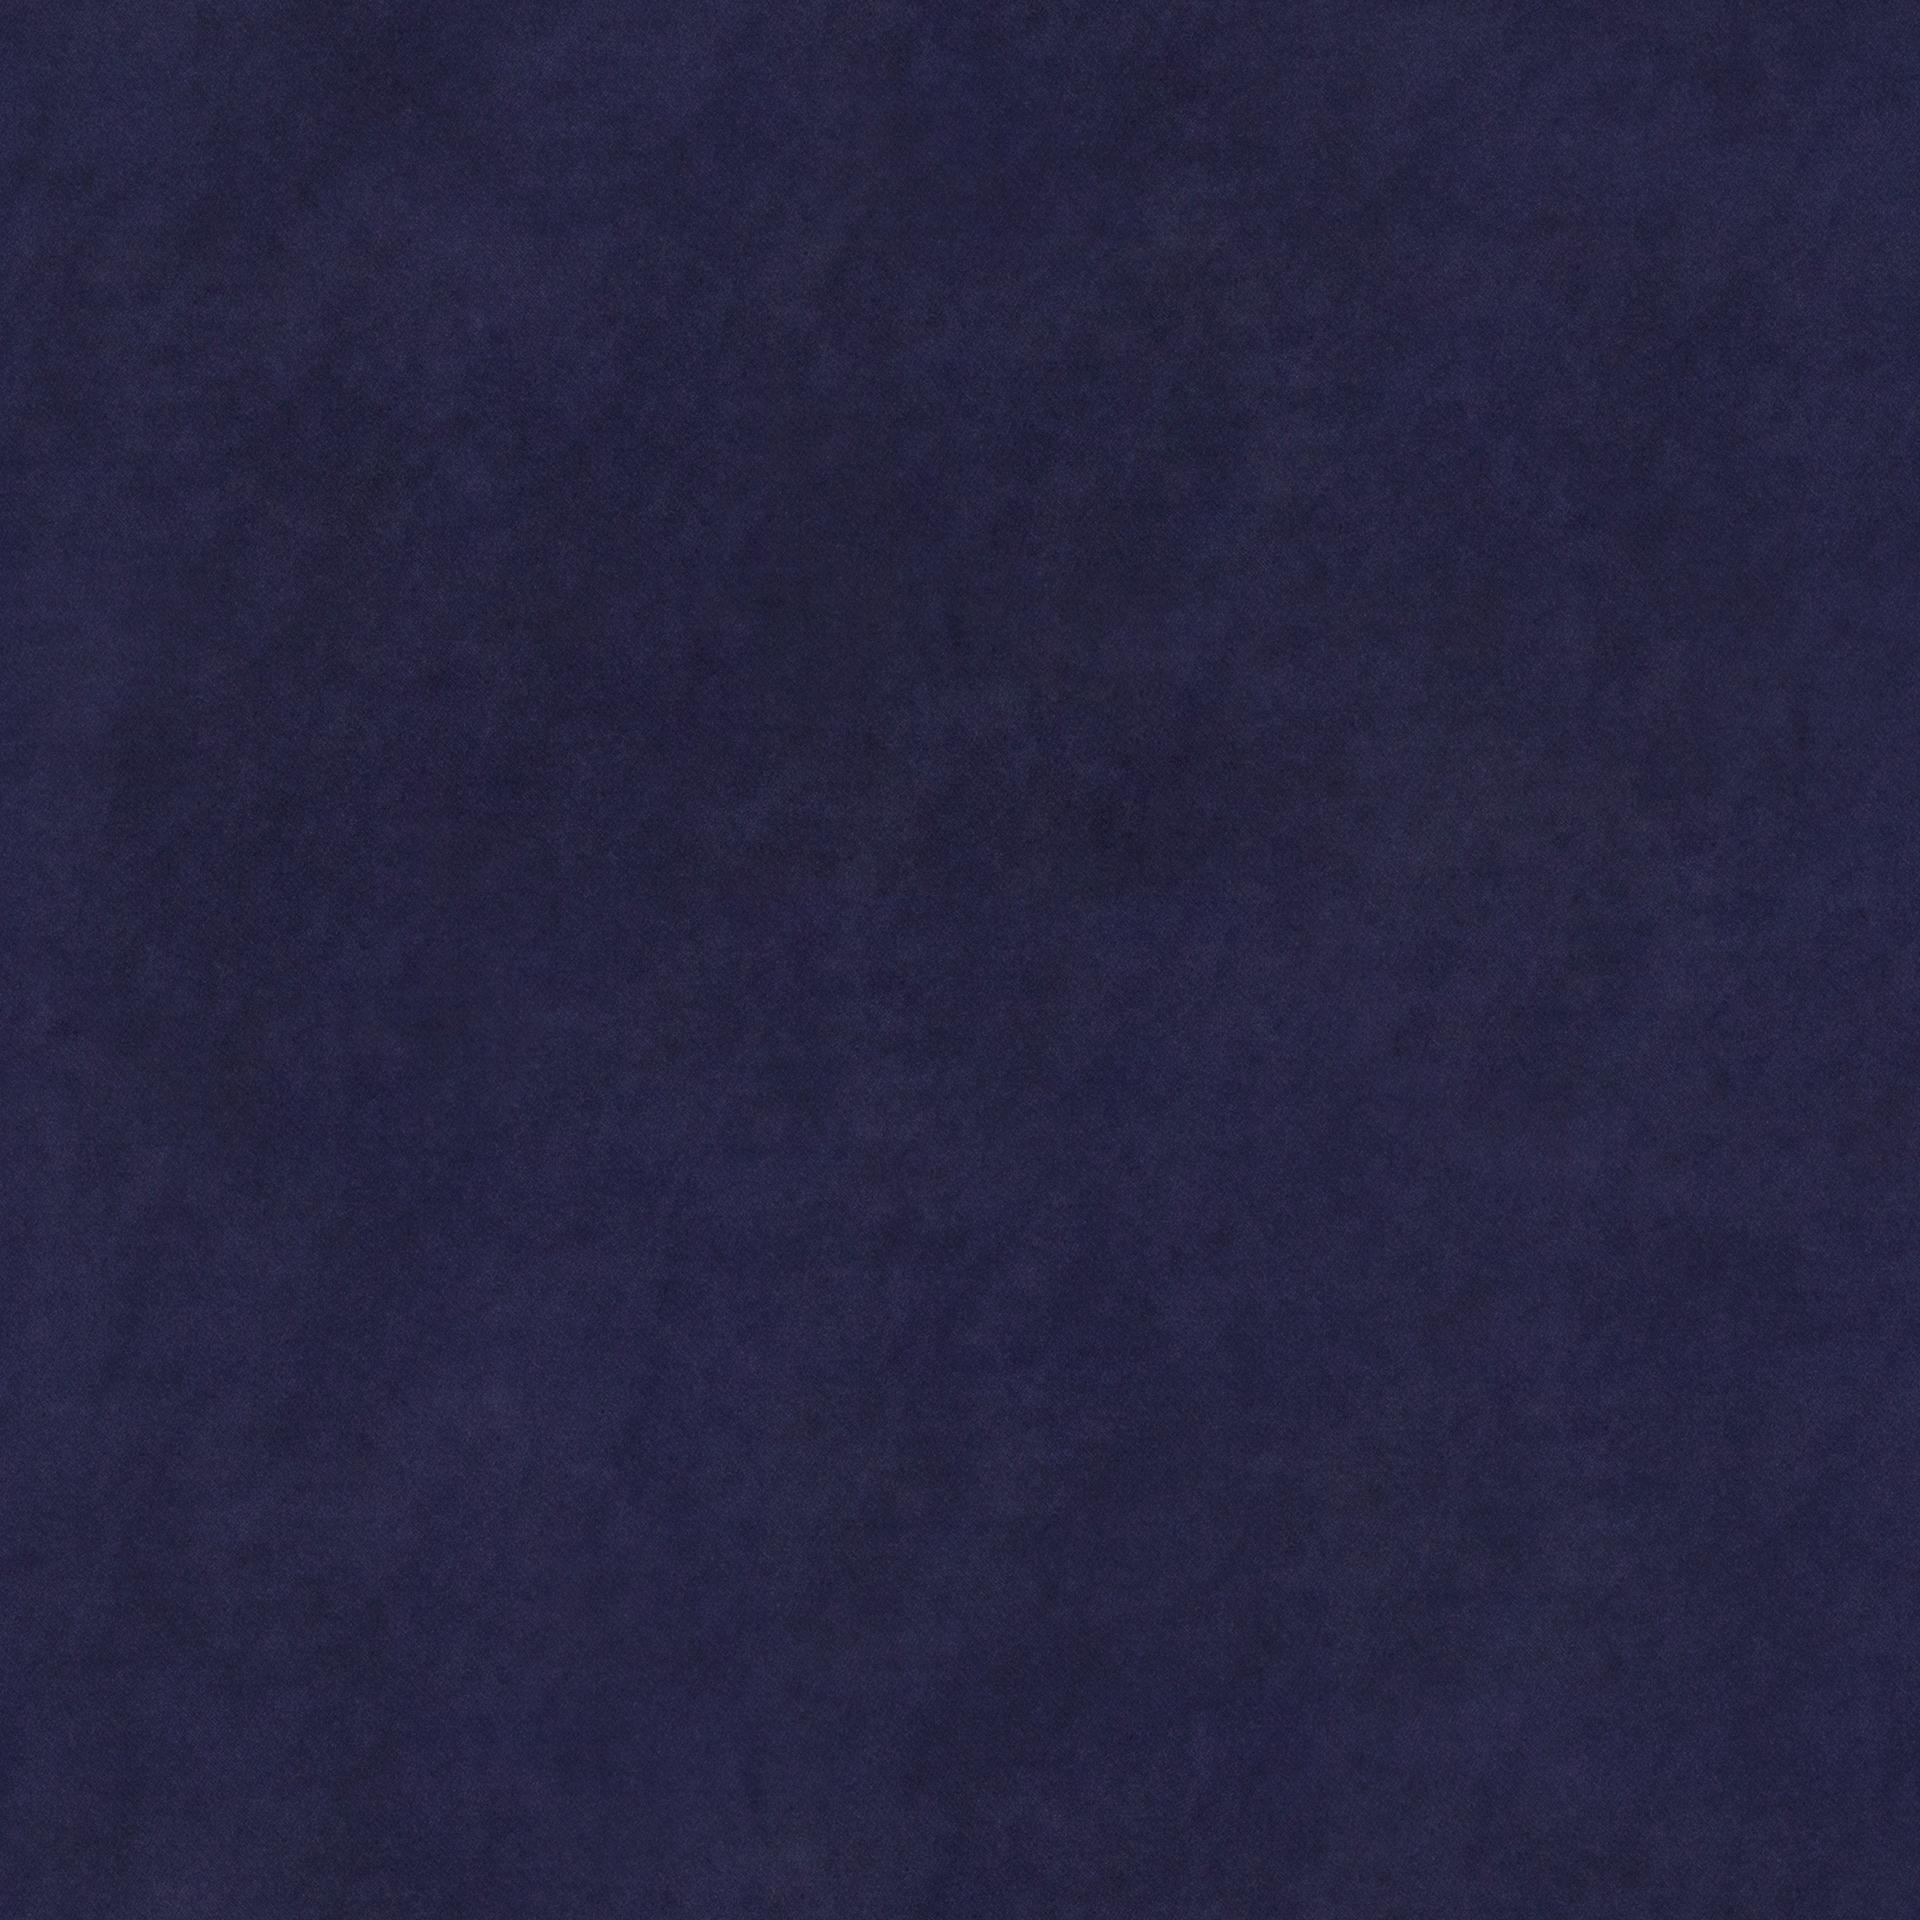 nachtblau BELTE47 (QUICK CLEAN)